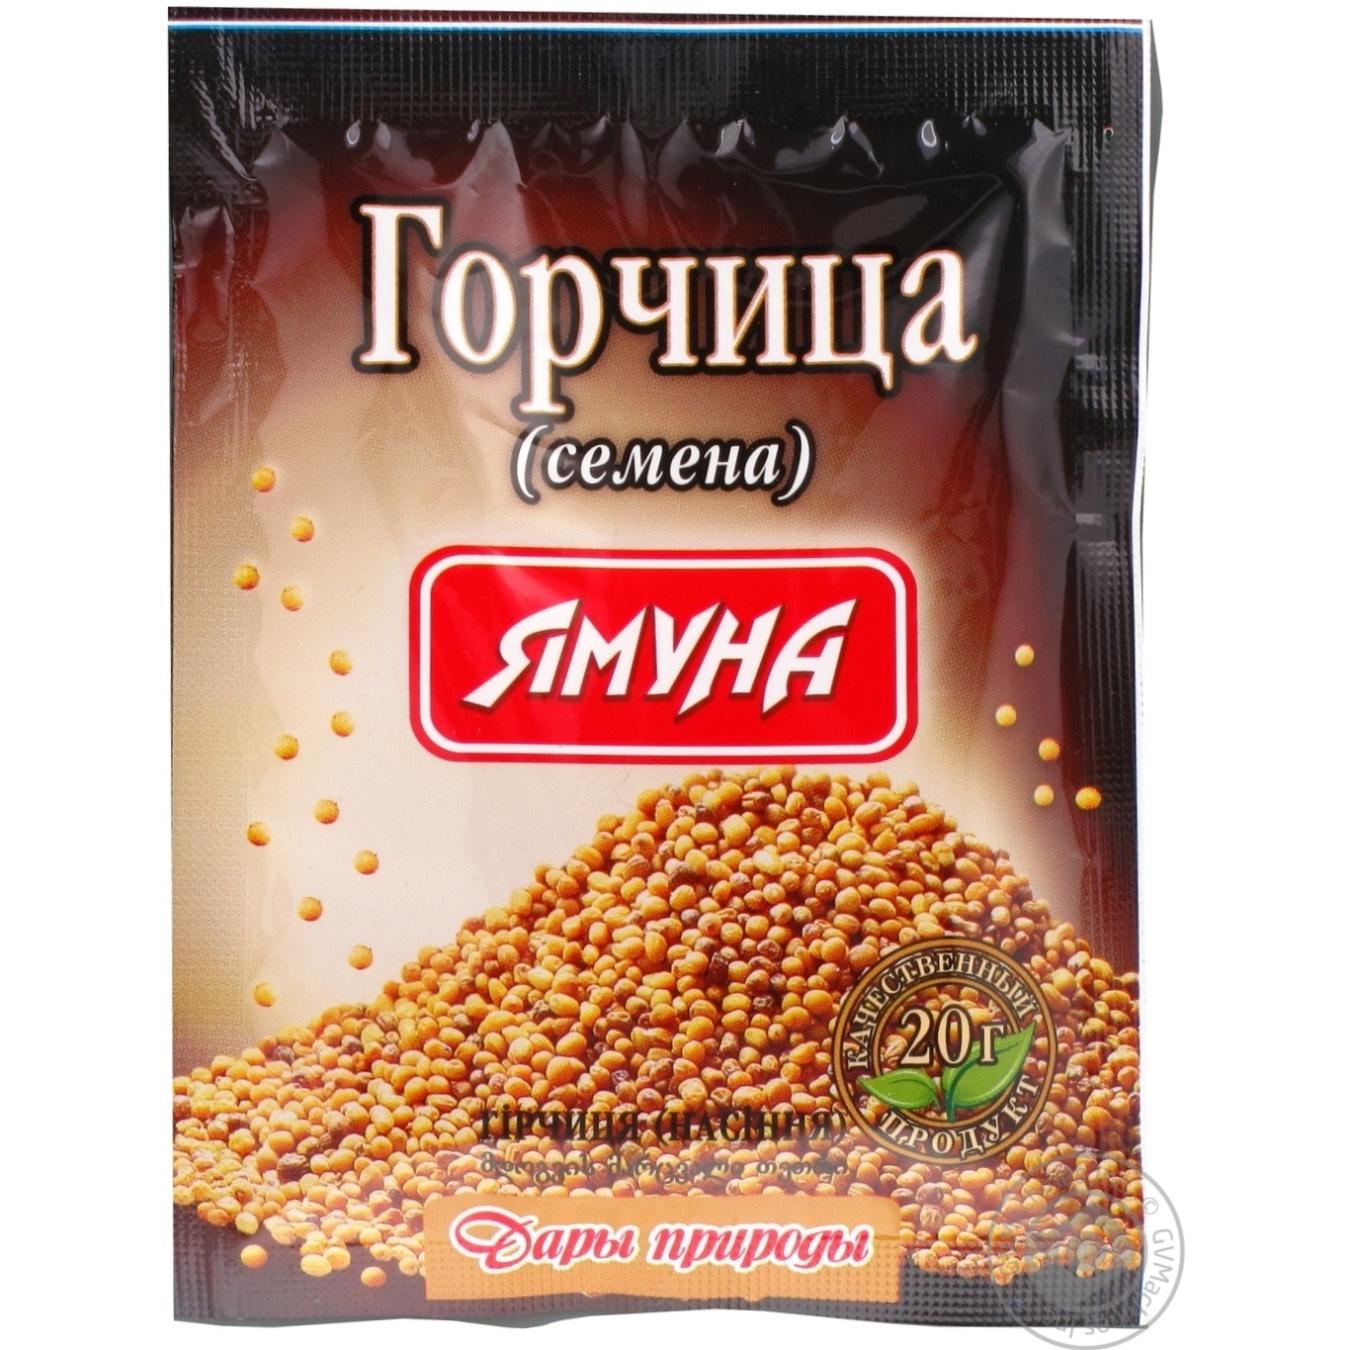 Купить Горчица (семена) Ямуна 20г